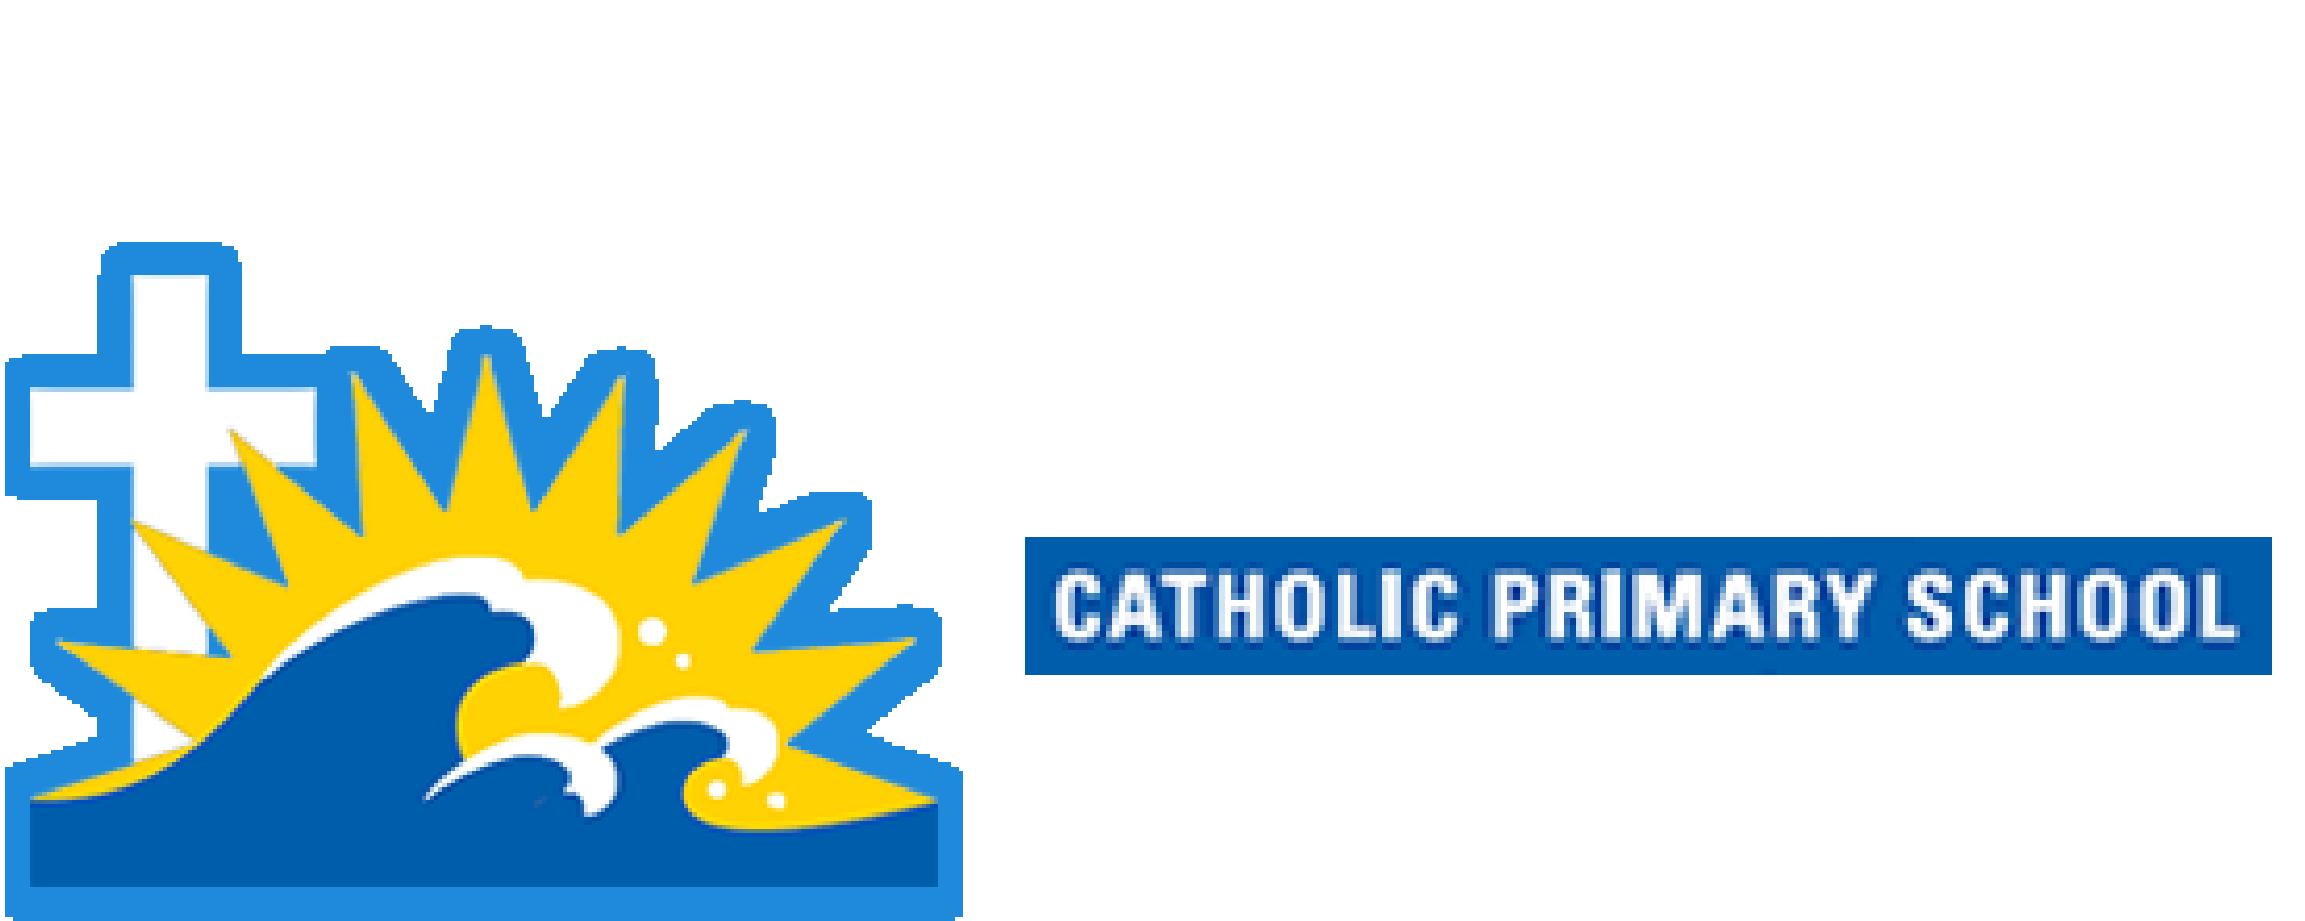 St Joseph's Narrabeen